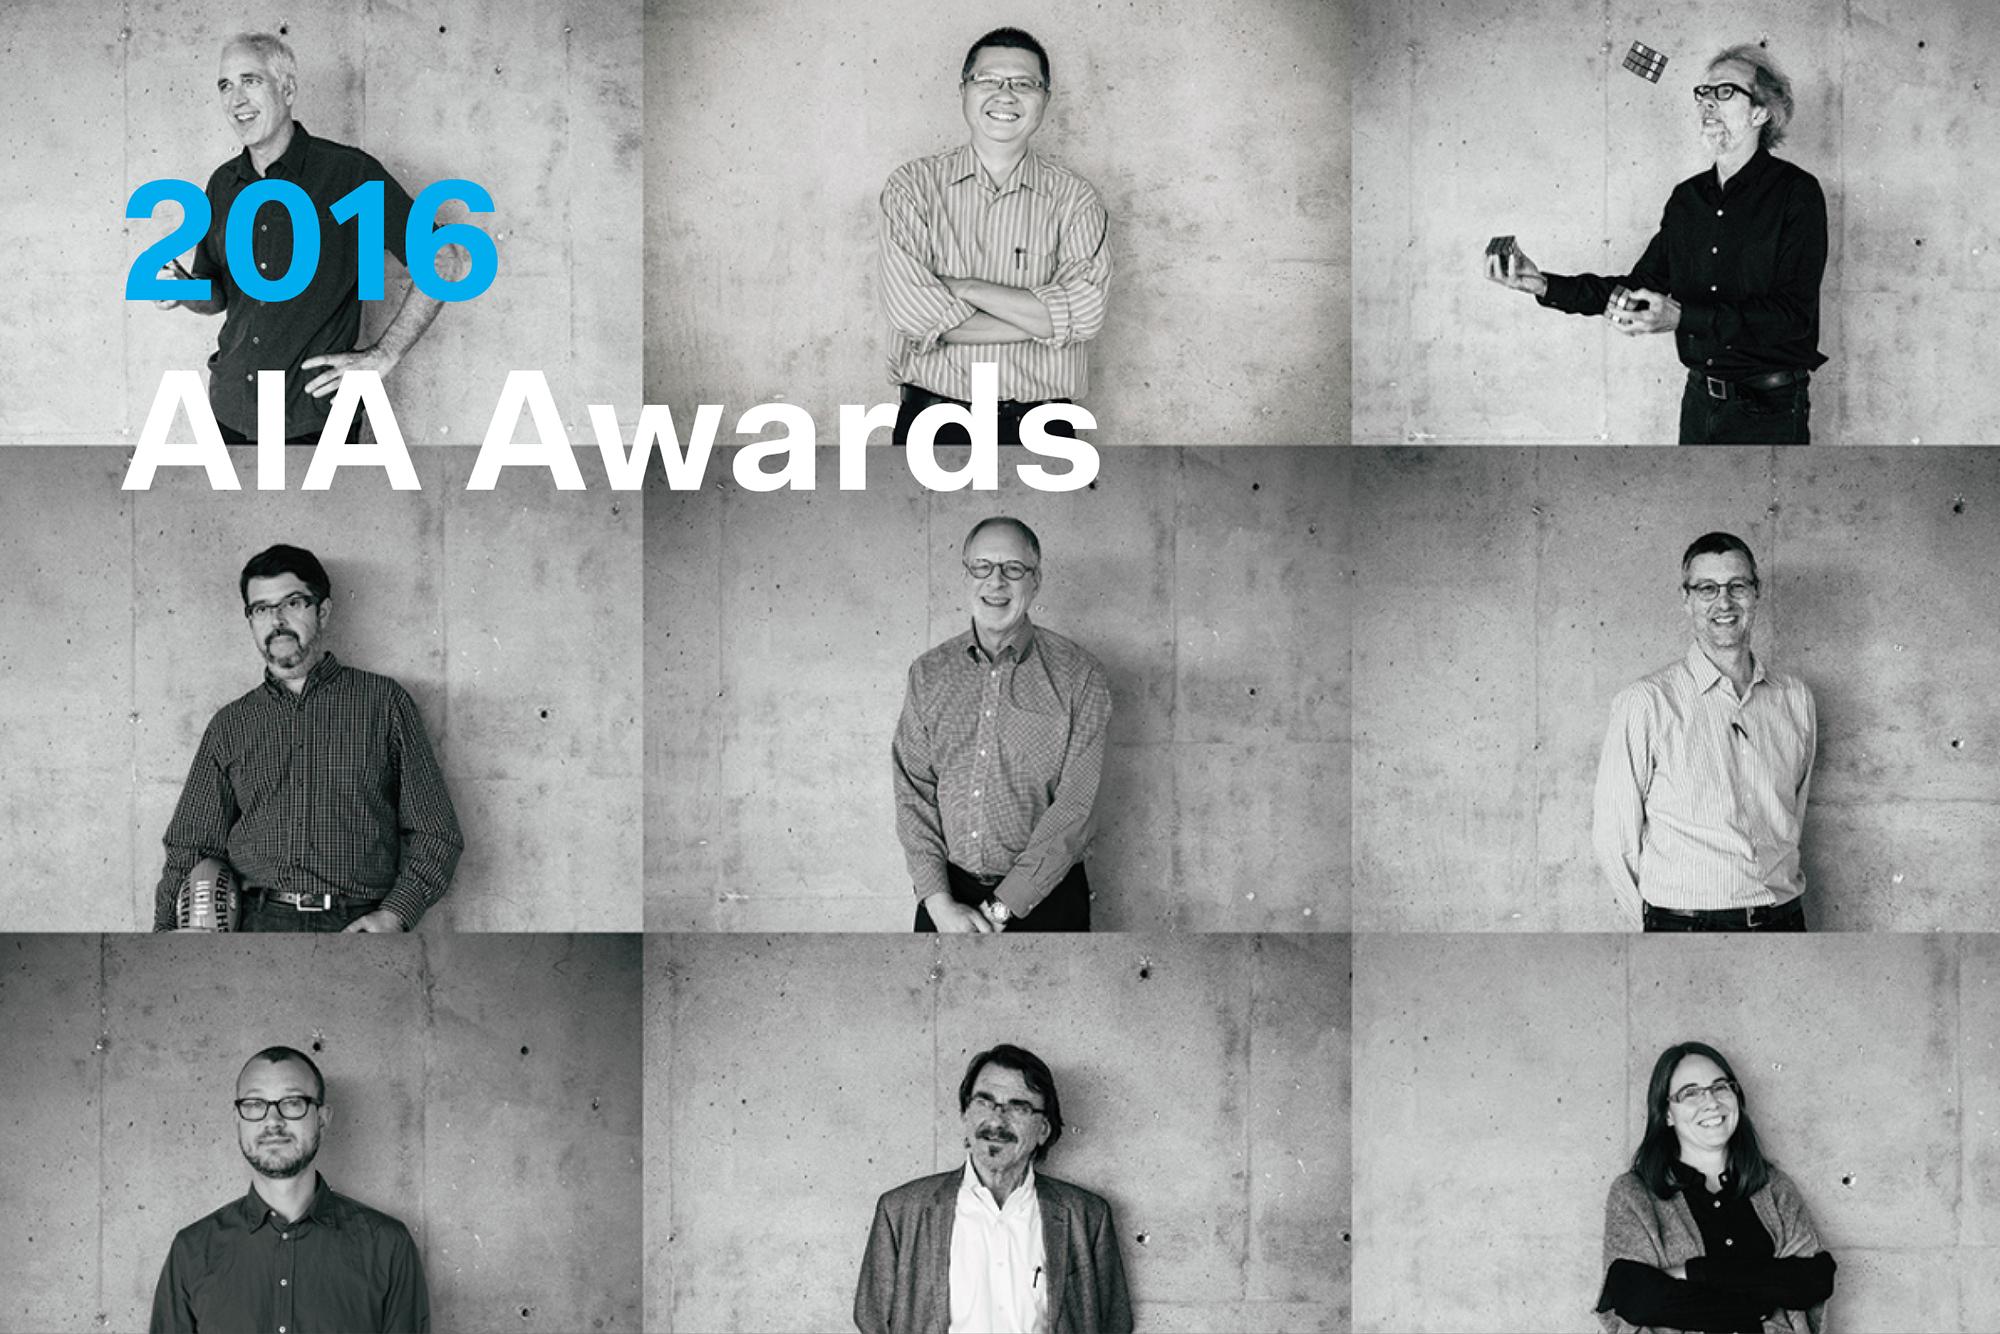 LMN Architects Wins The 2016 AIA Architecture Firm Award   Architect  Magazine   Awards, 2016 AIA Honor Awards, AIA Architecture Firm Award, ...